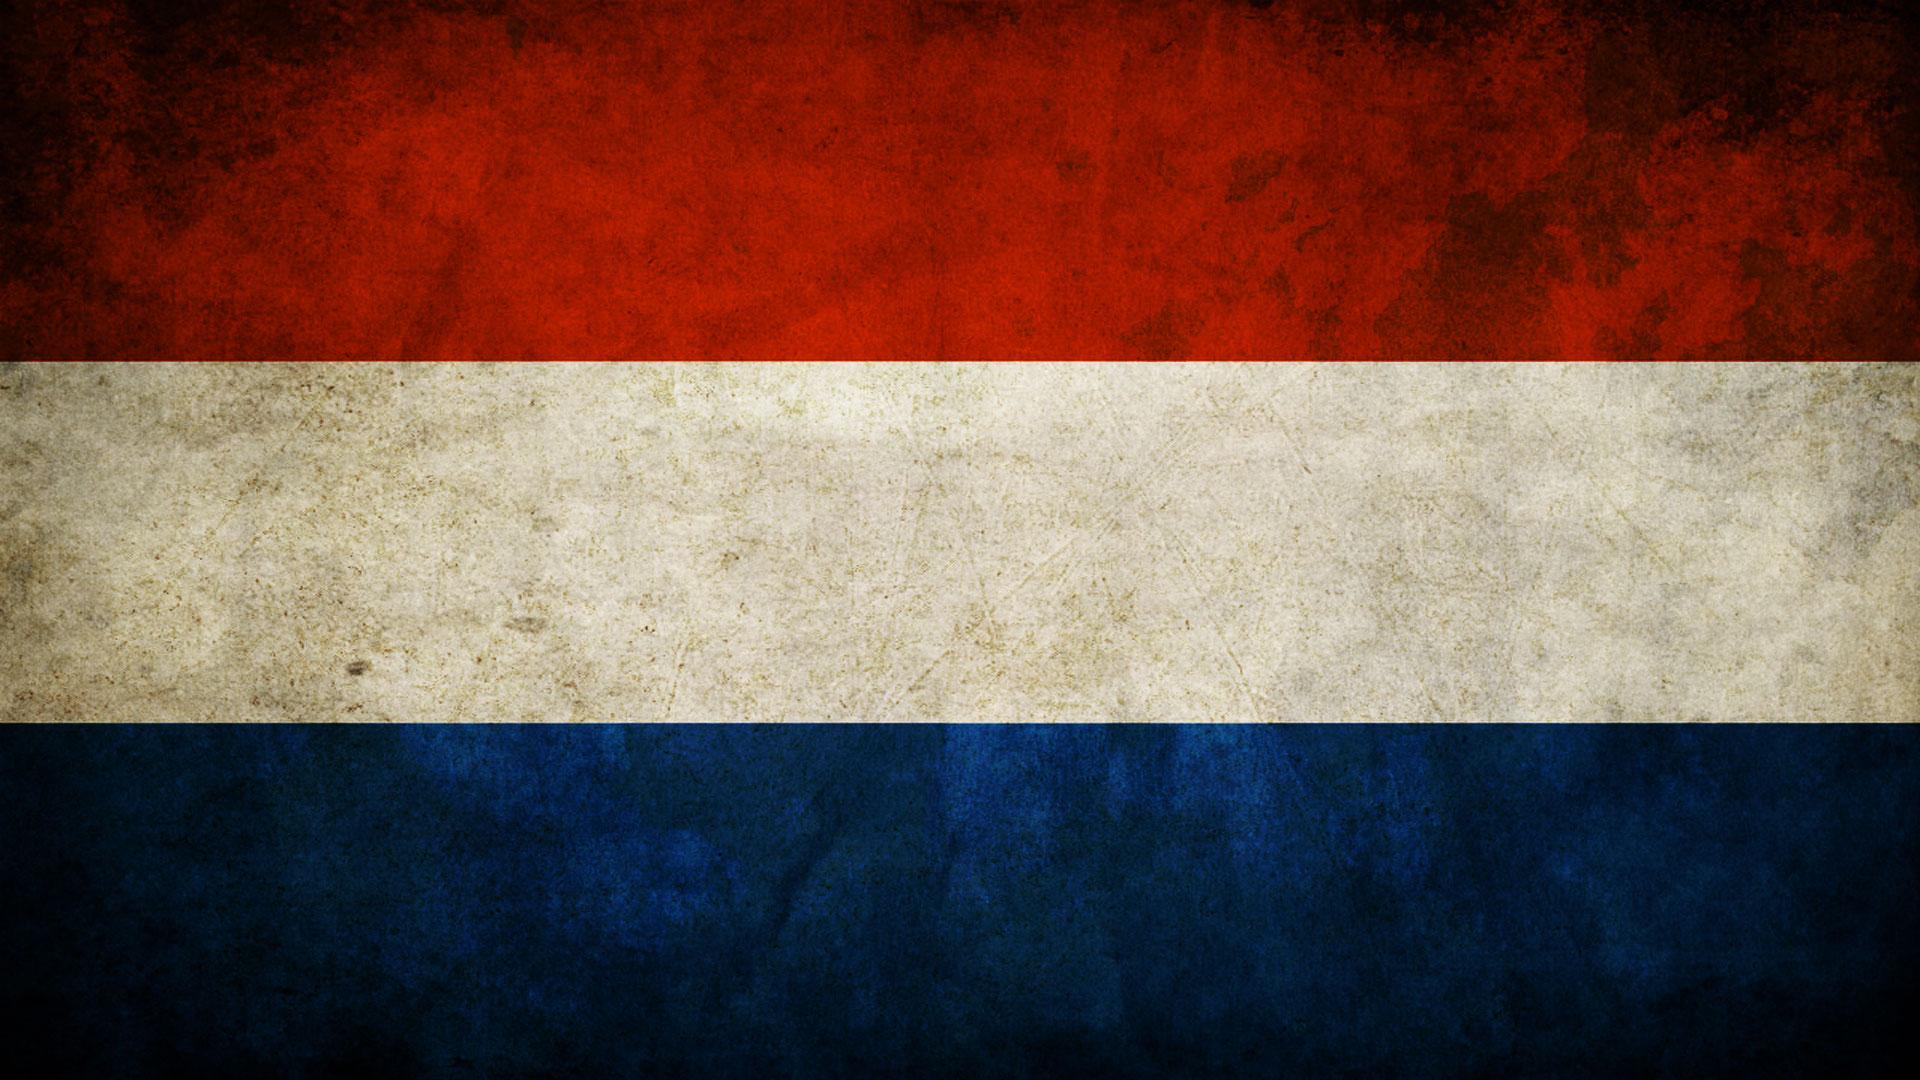 image dutch flag jpg navalaction wikia fandom powered by wikia